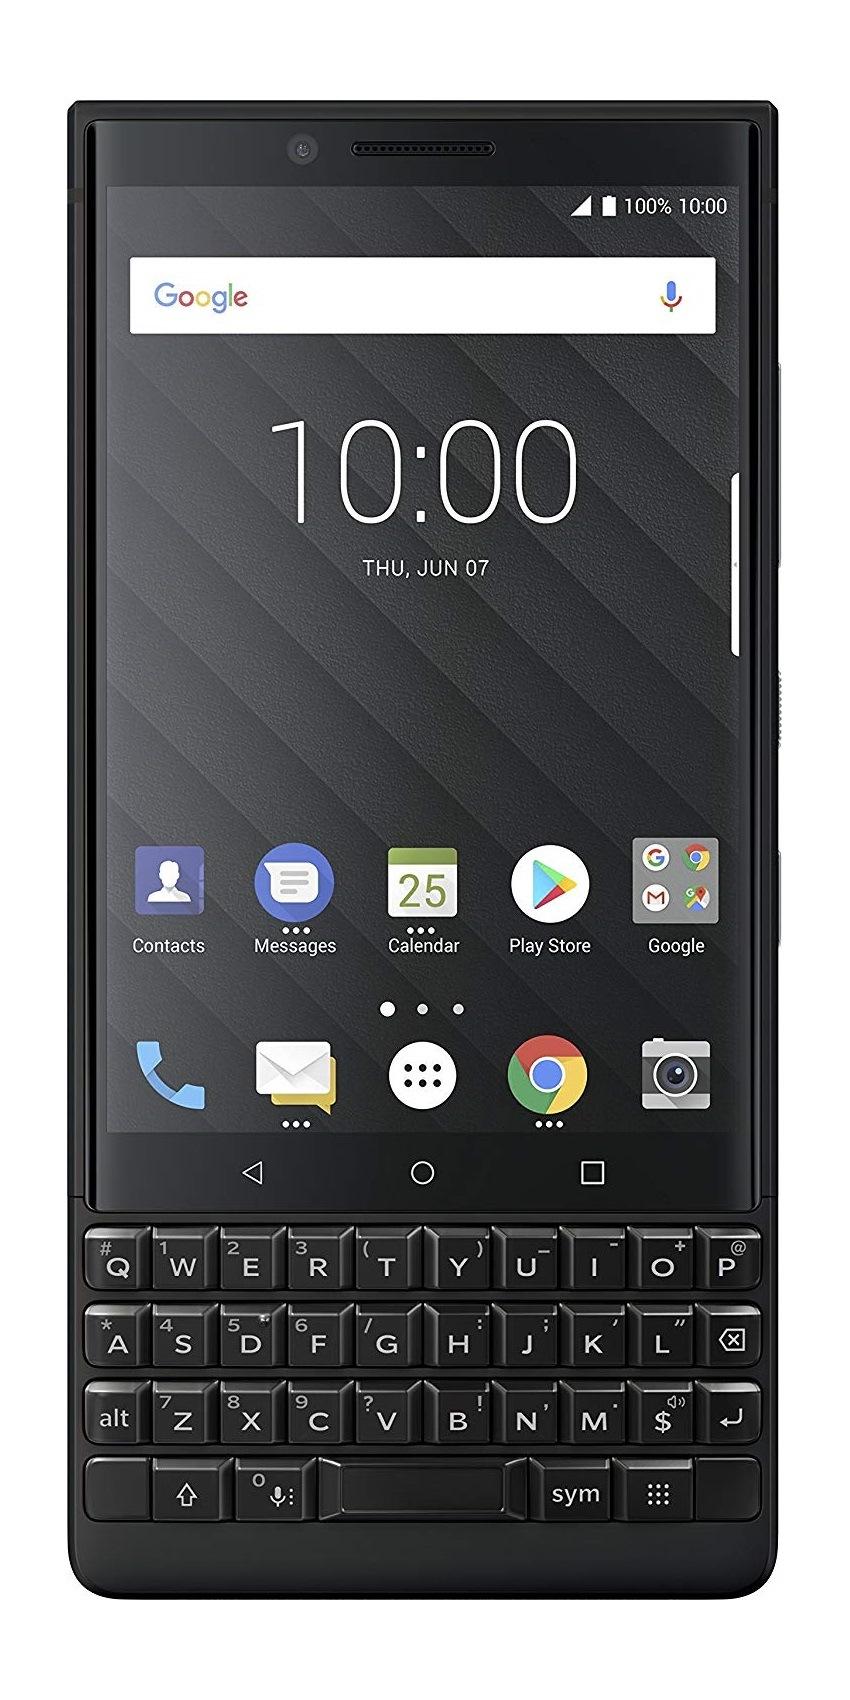 Battery Replacement for BlackBerry BBF100-1 BBF100-2 BBF100-4 BBF100-6 BBF100-8 BBF100-9 KEY2 KEY2 LE Record